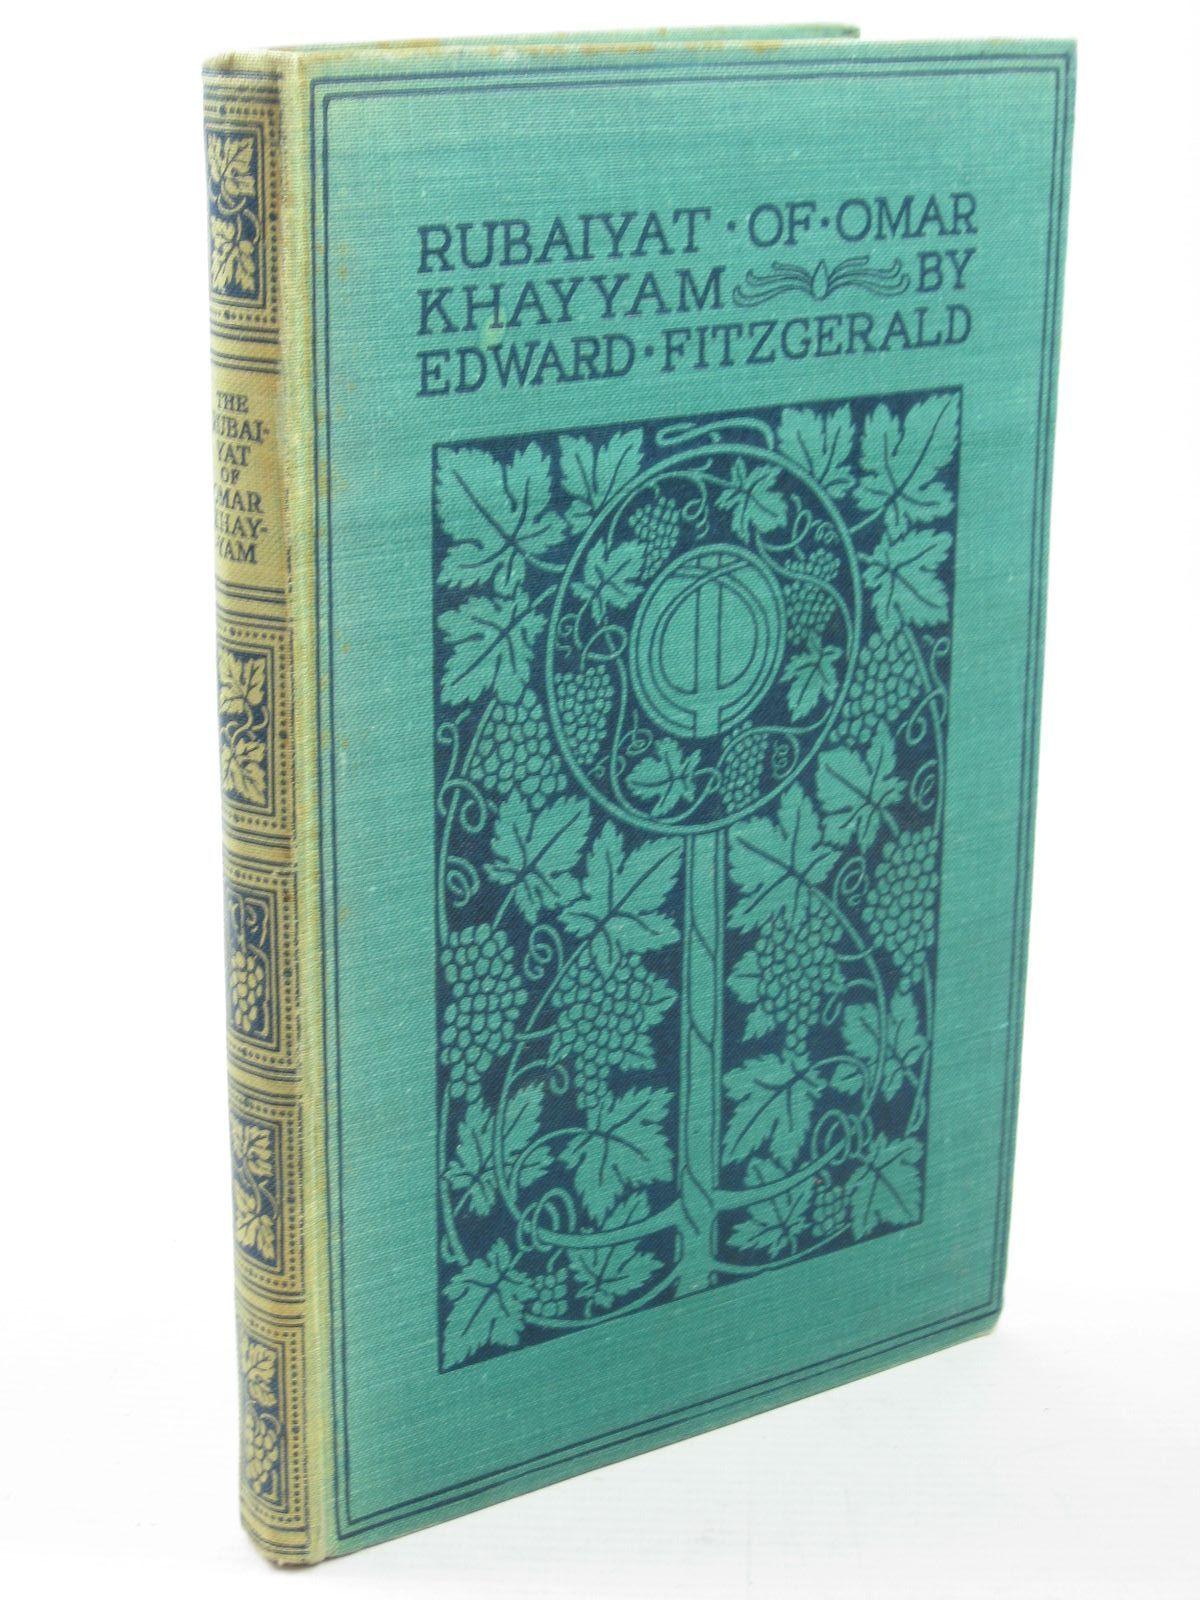 The Rubáiyát of Omar Khayyám (Fitzgerald 5th edition)